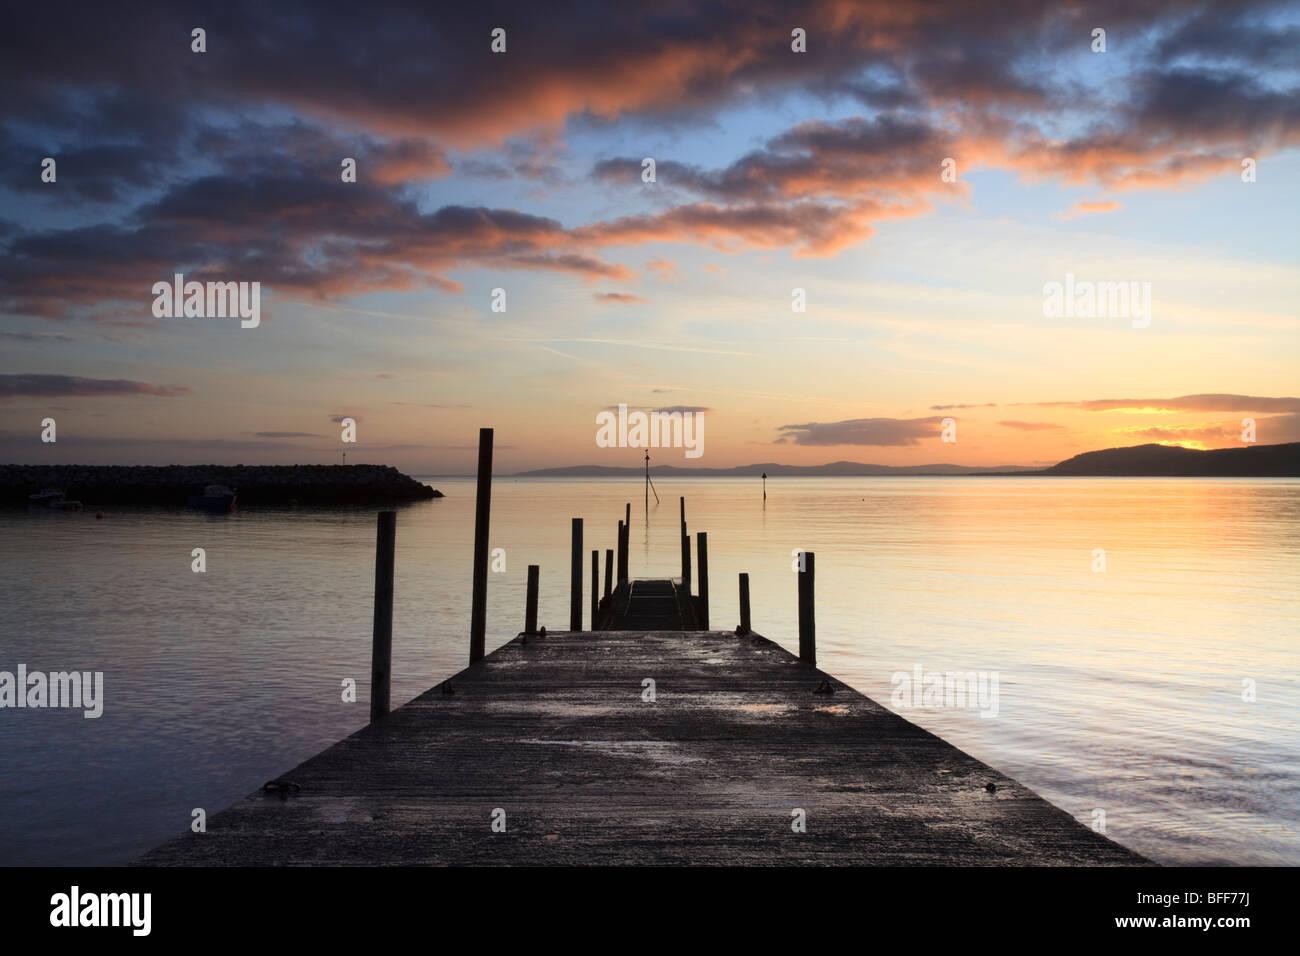 sunrise over Rhos on Sea, Llandrillo, Conwy, Wales, UK Stock Photo